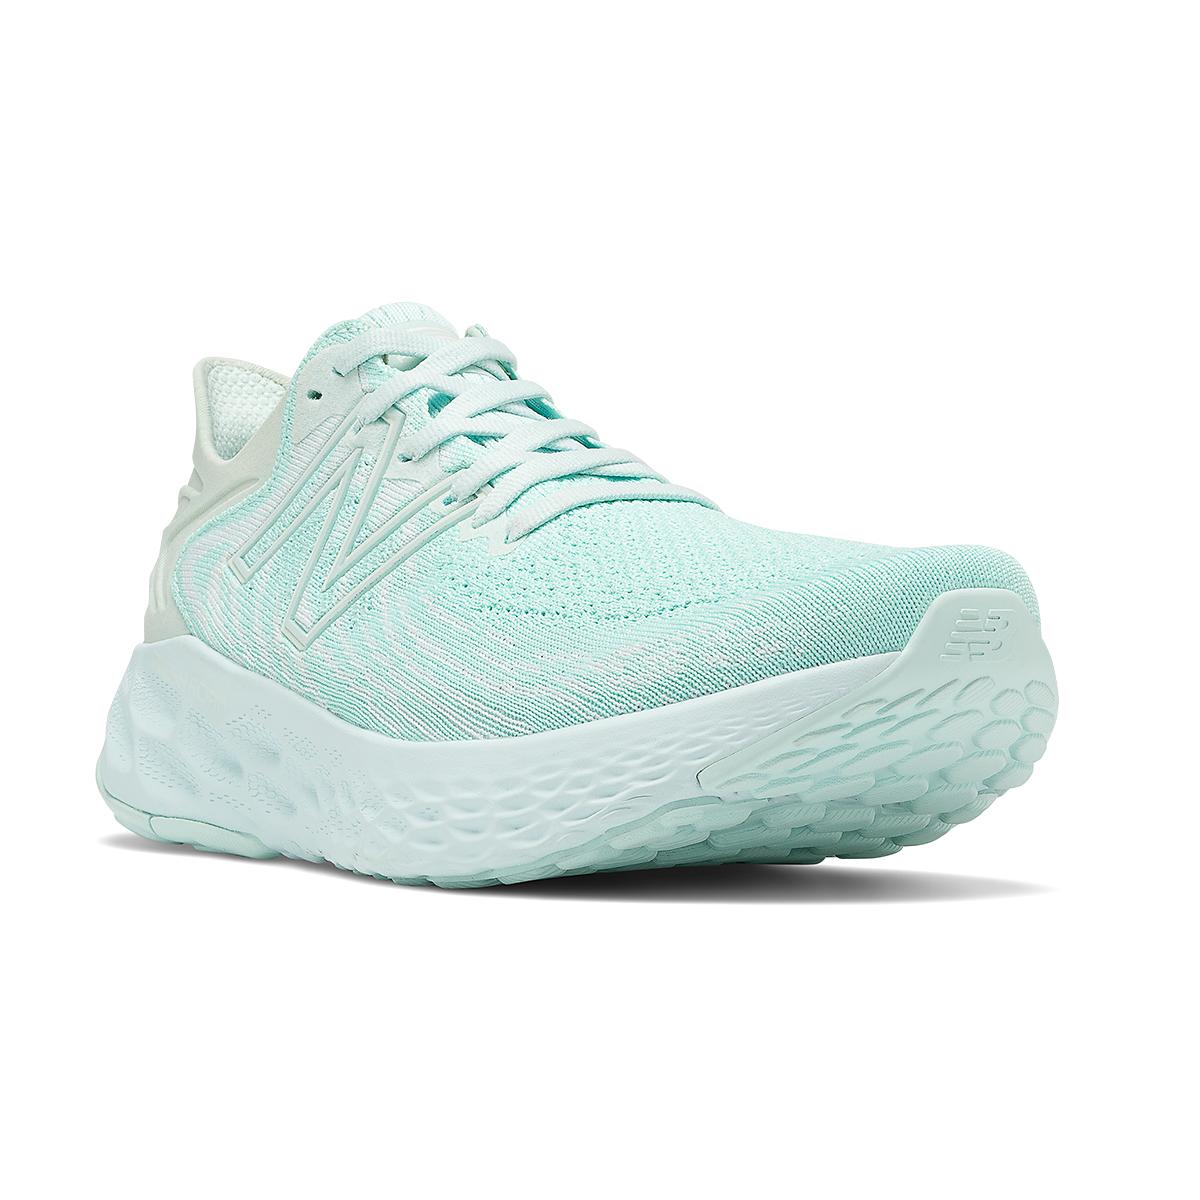 Women's New Balance Fresh Foam 1080V11 Running Shoe - Color: White Mint/White Jade - Size: 13 - Width: Regular, Mint Green, large, image 3